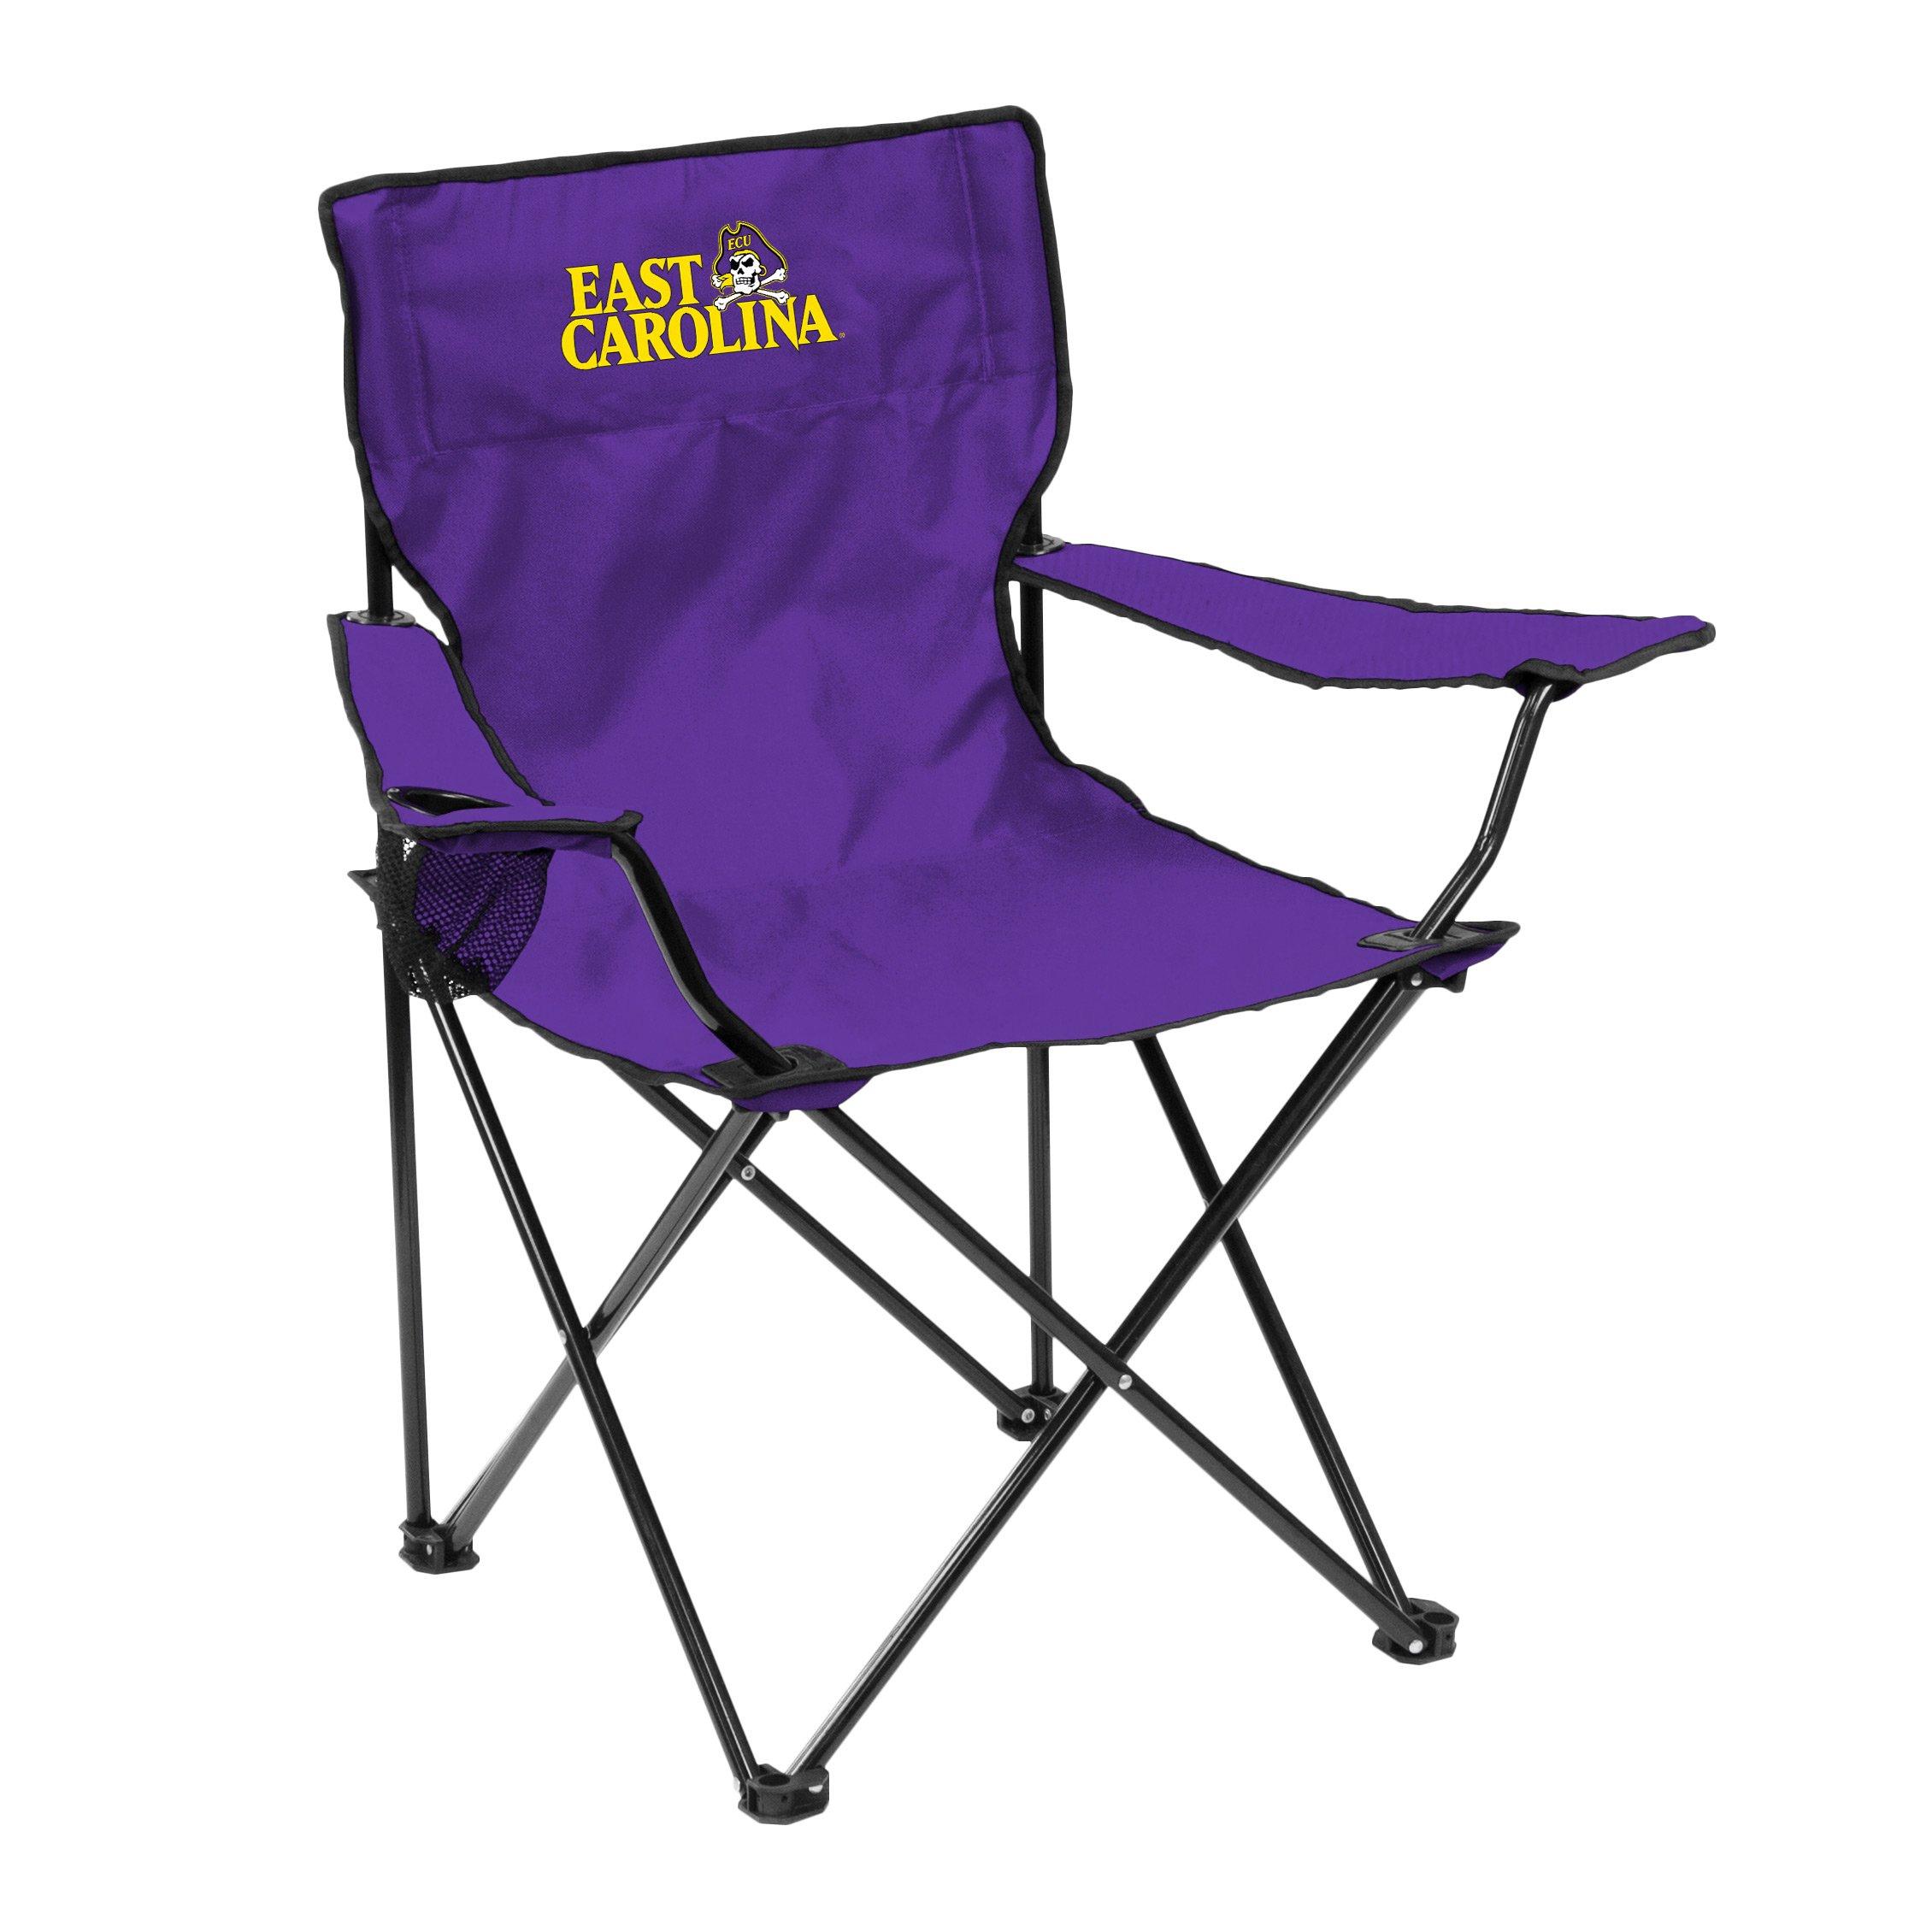 NCAA East Carolina Pirates Adult Quad Chair, Purple